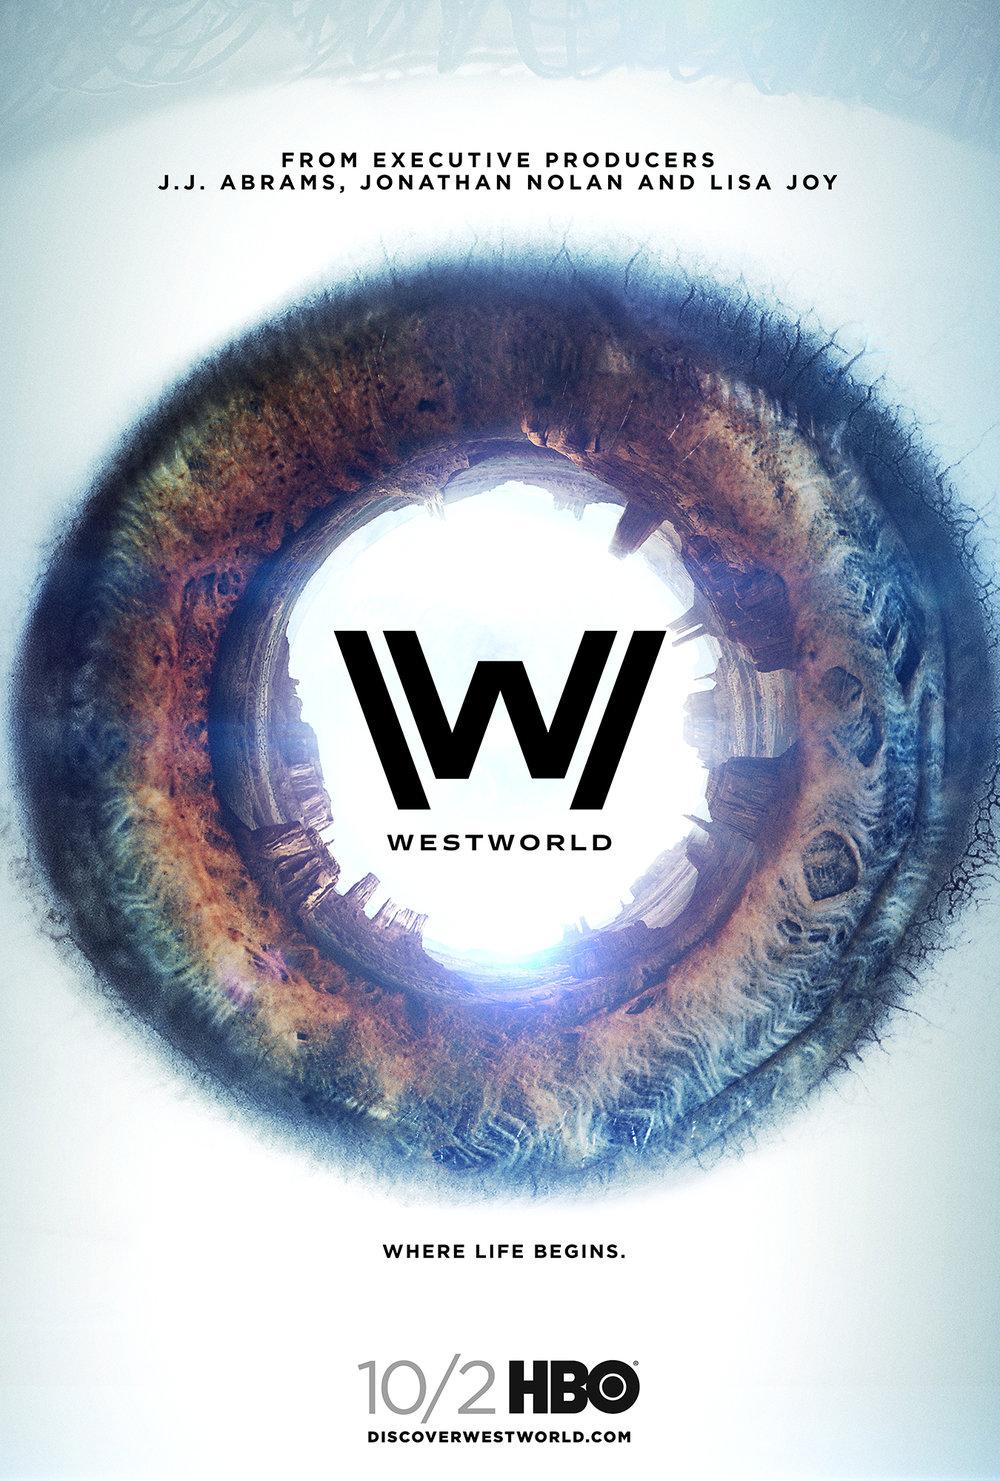 Westworld_1Sht_100dpi.jpg